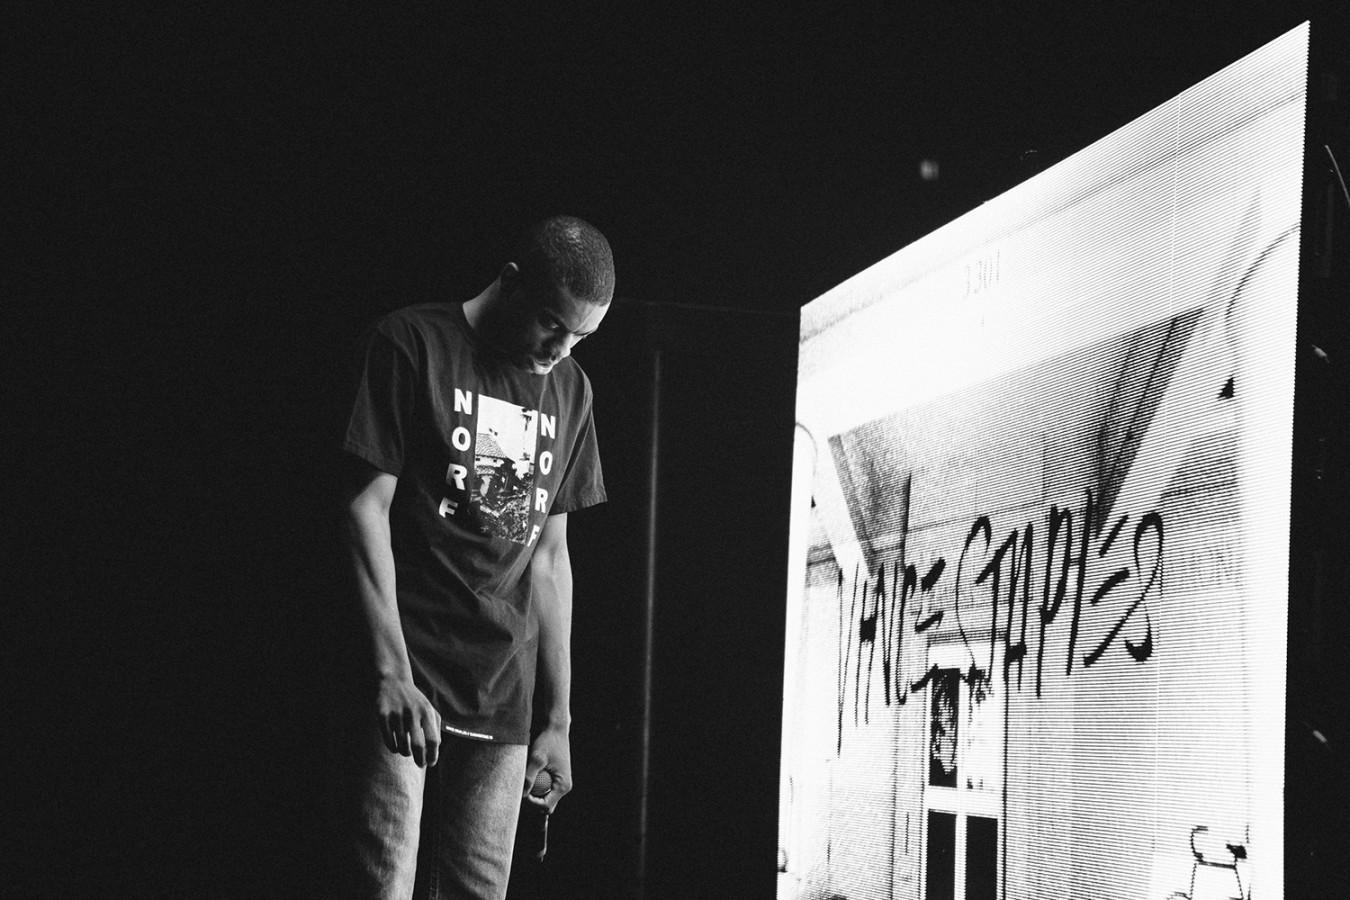 asap-rocky-tyler-the-creator-tour-backstage-26-1350x900